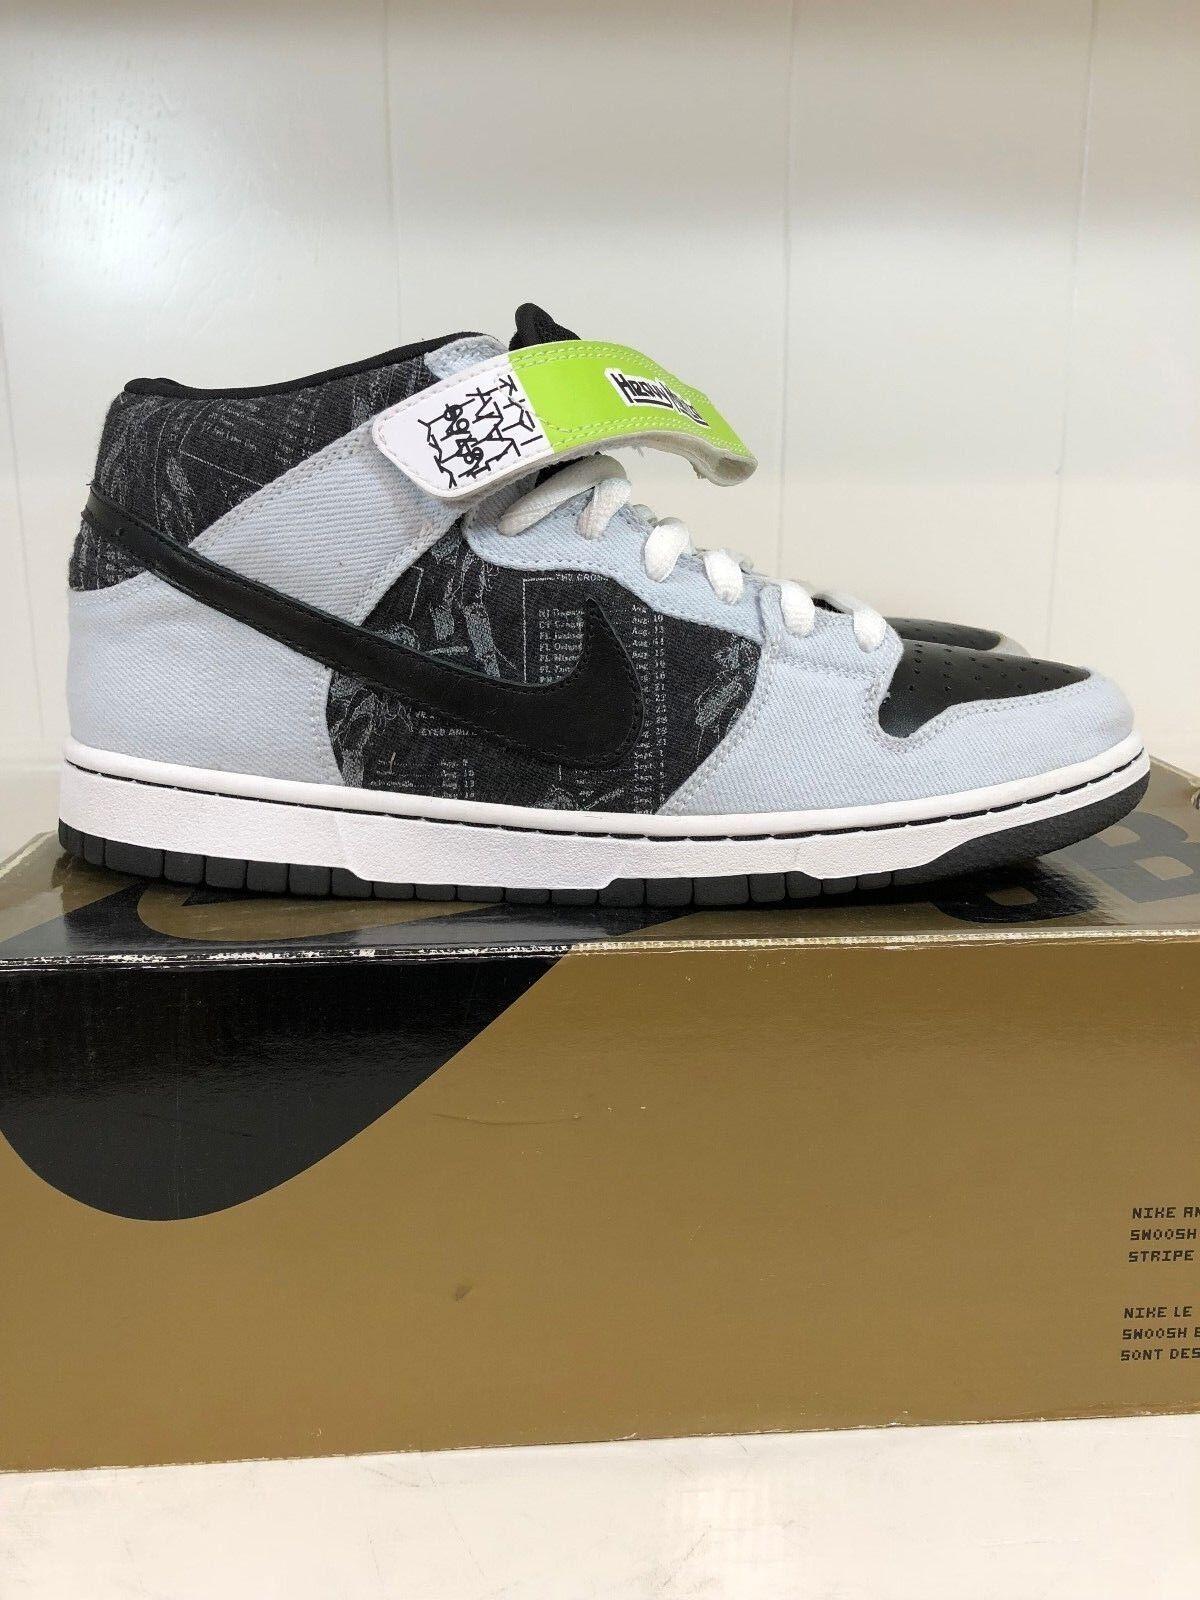 Nike SB Dunk Mid Heavy Mental 10 denim paris supreme medicom freddy skate mental The most popular shoes for men and women